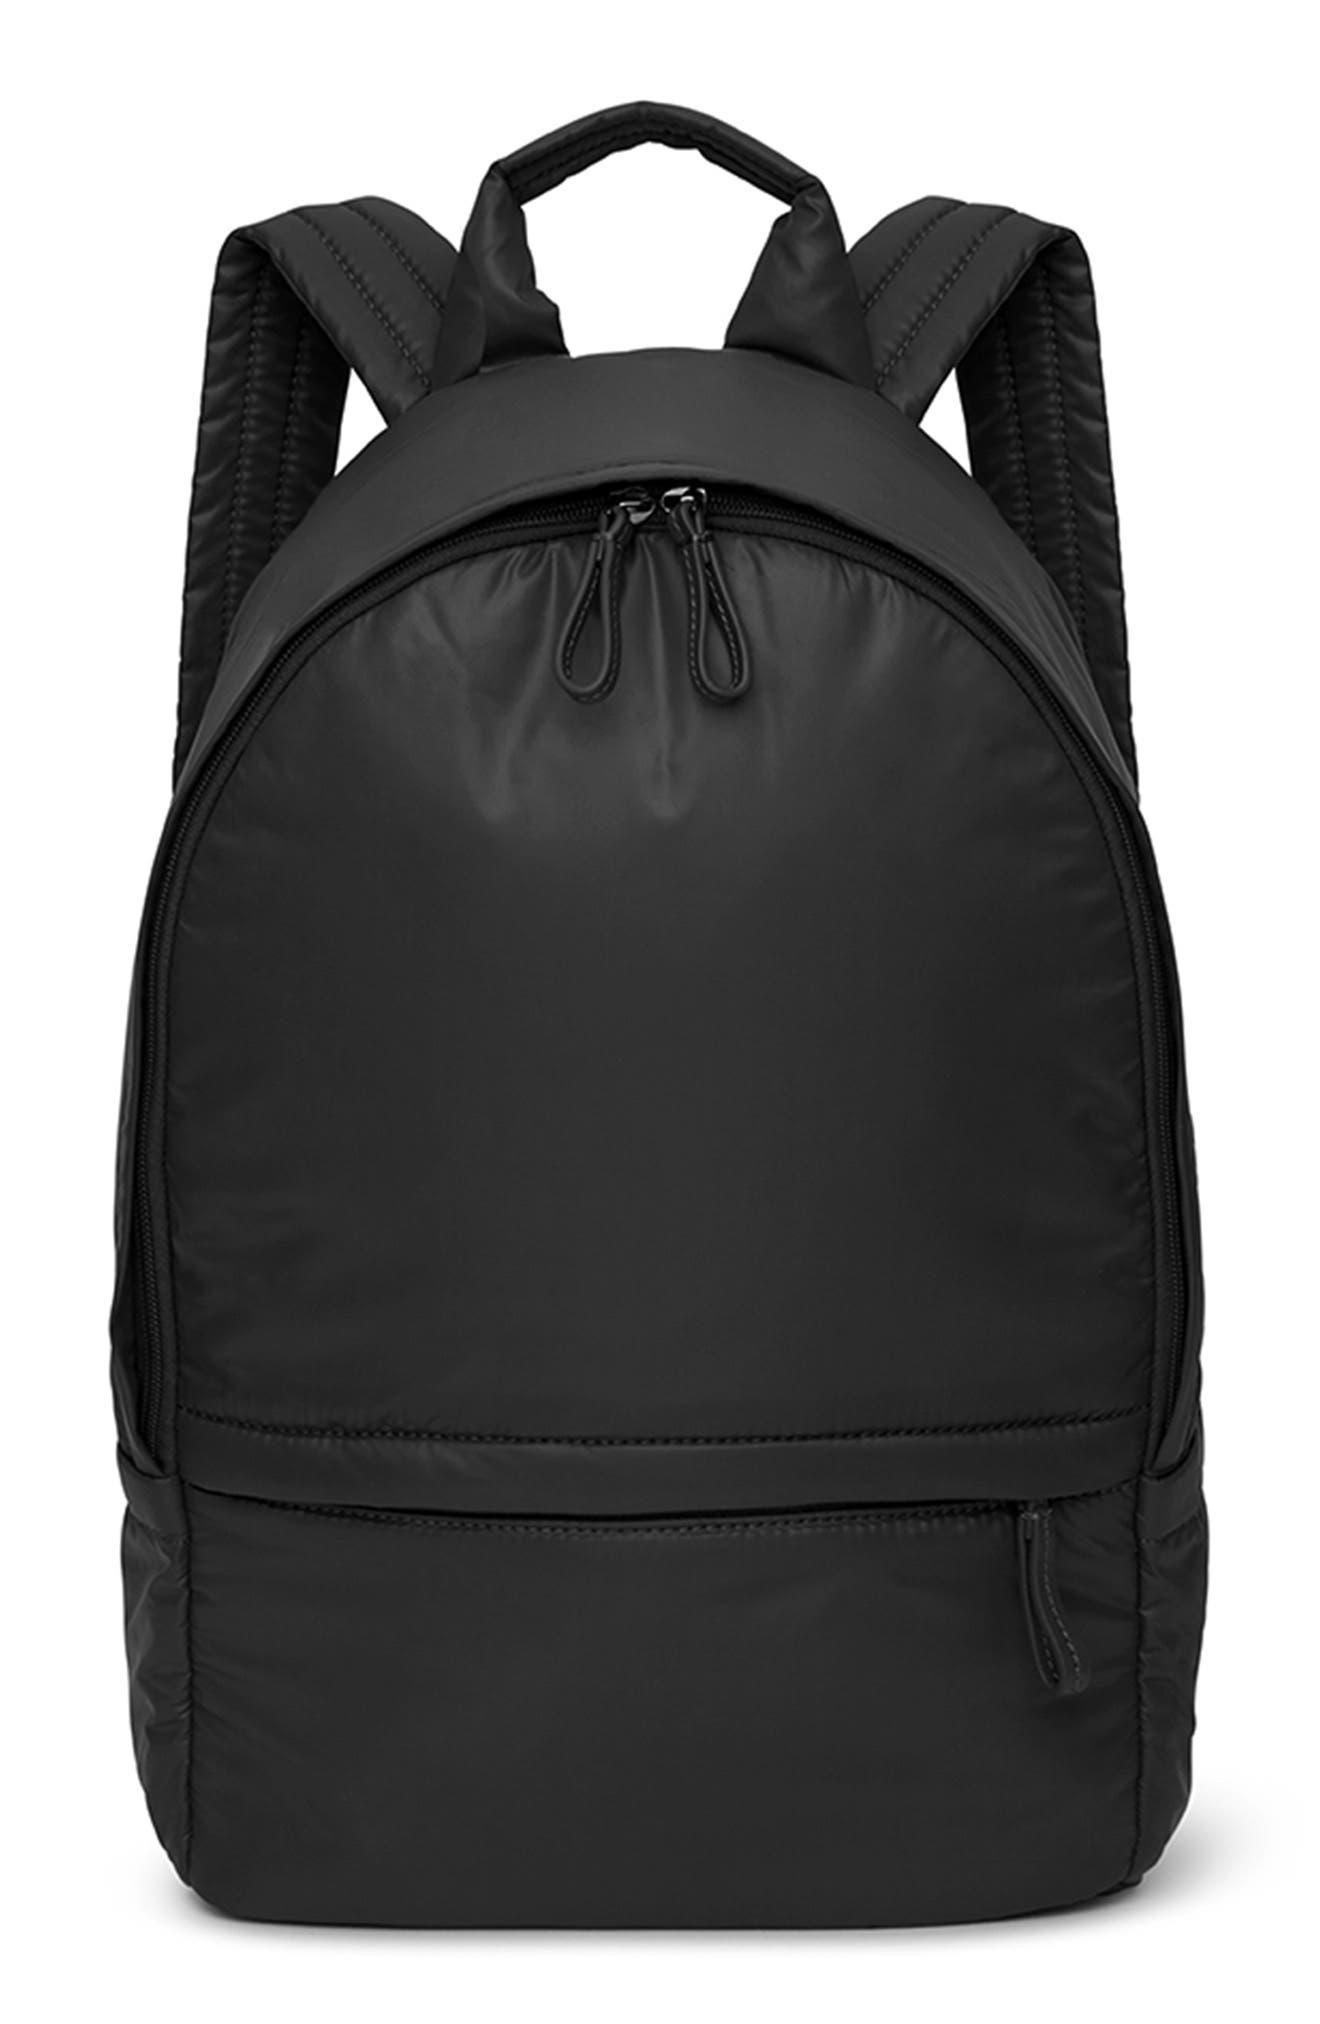 CARAA Stratus Waterproof Backpack, Main, color, BLACK